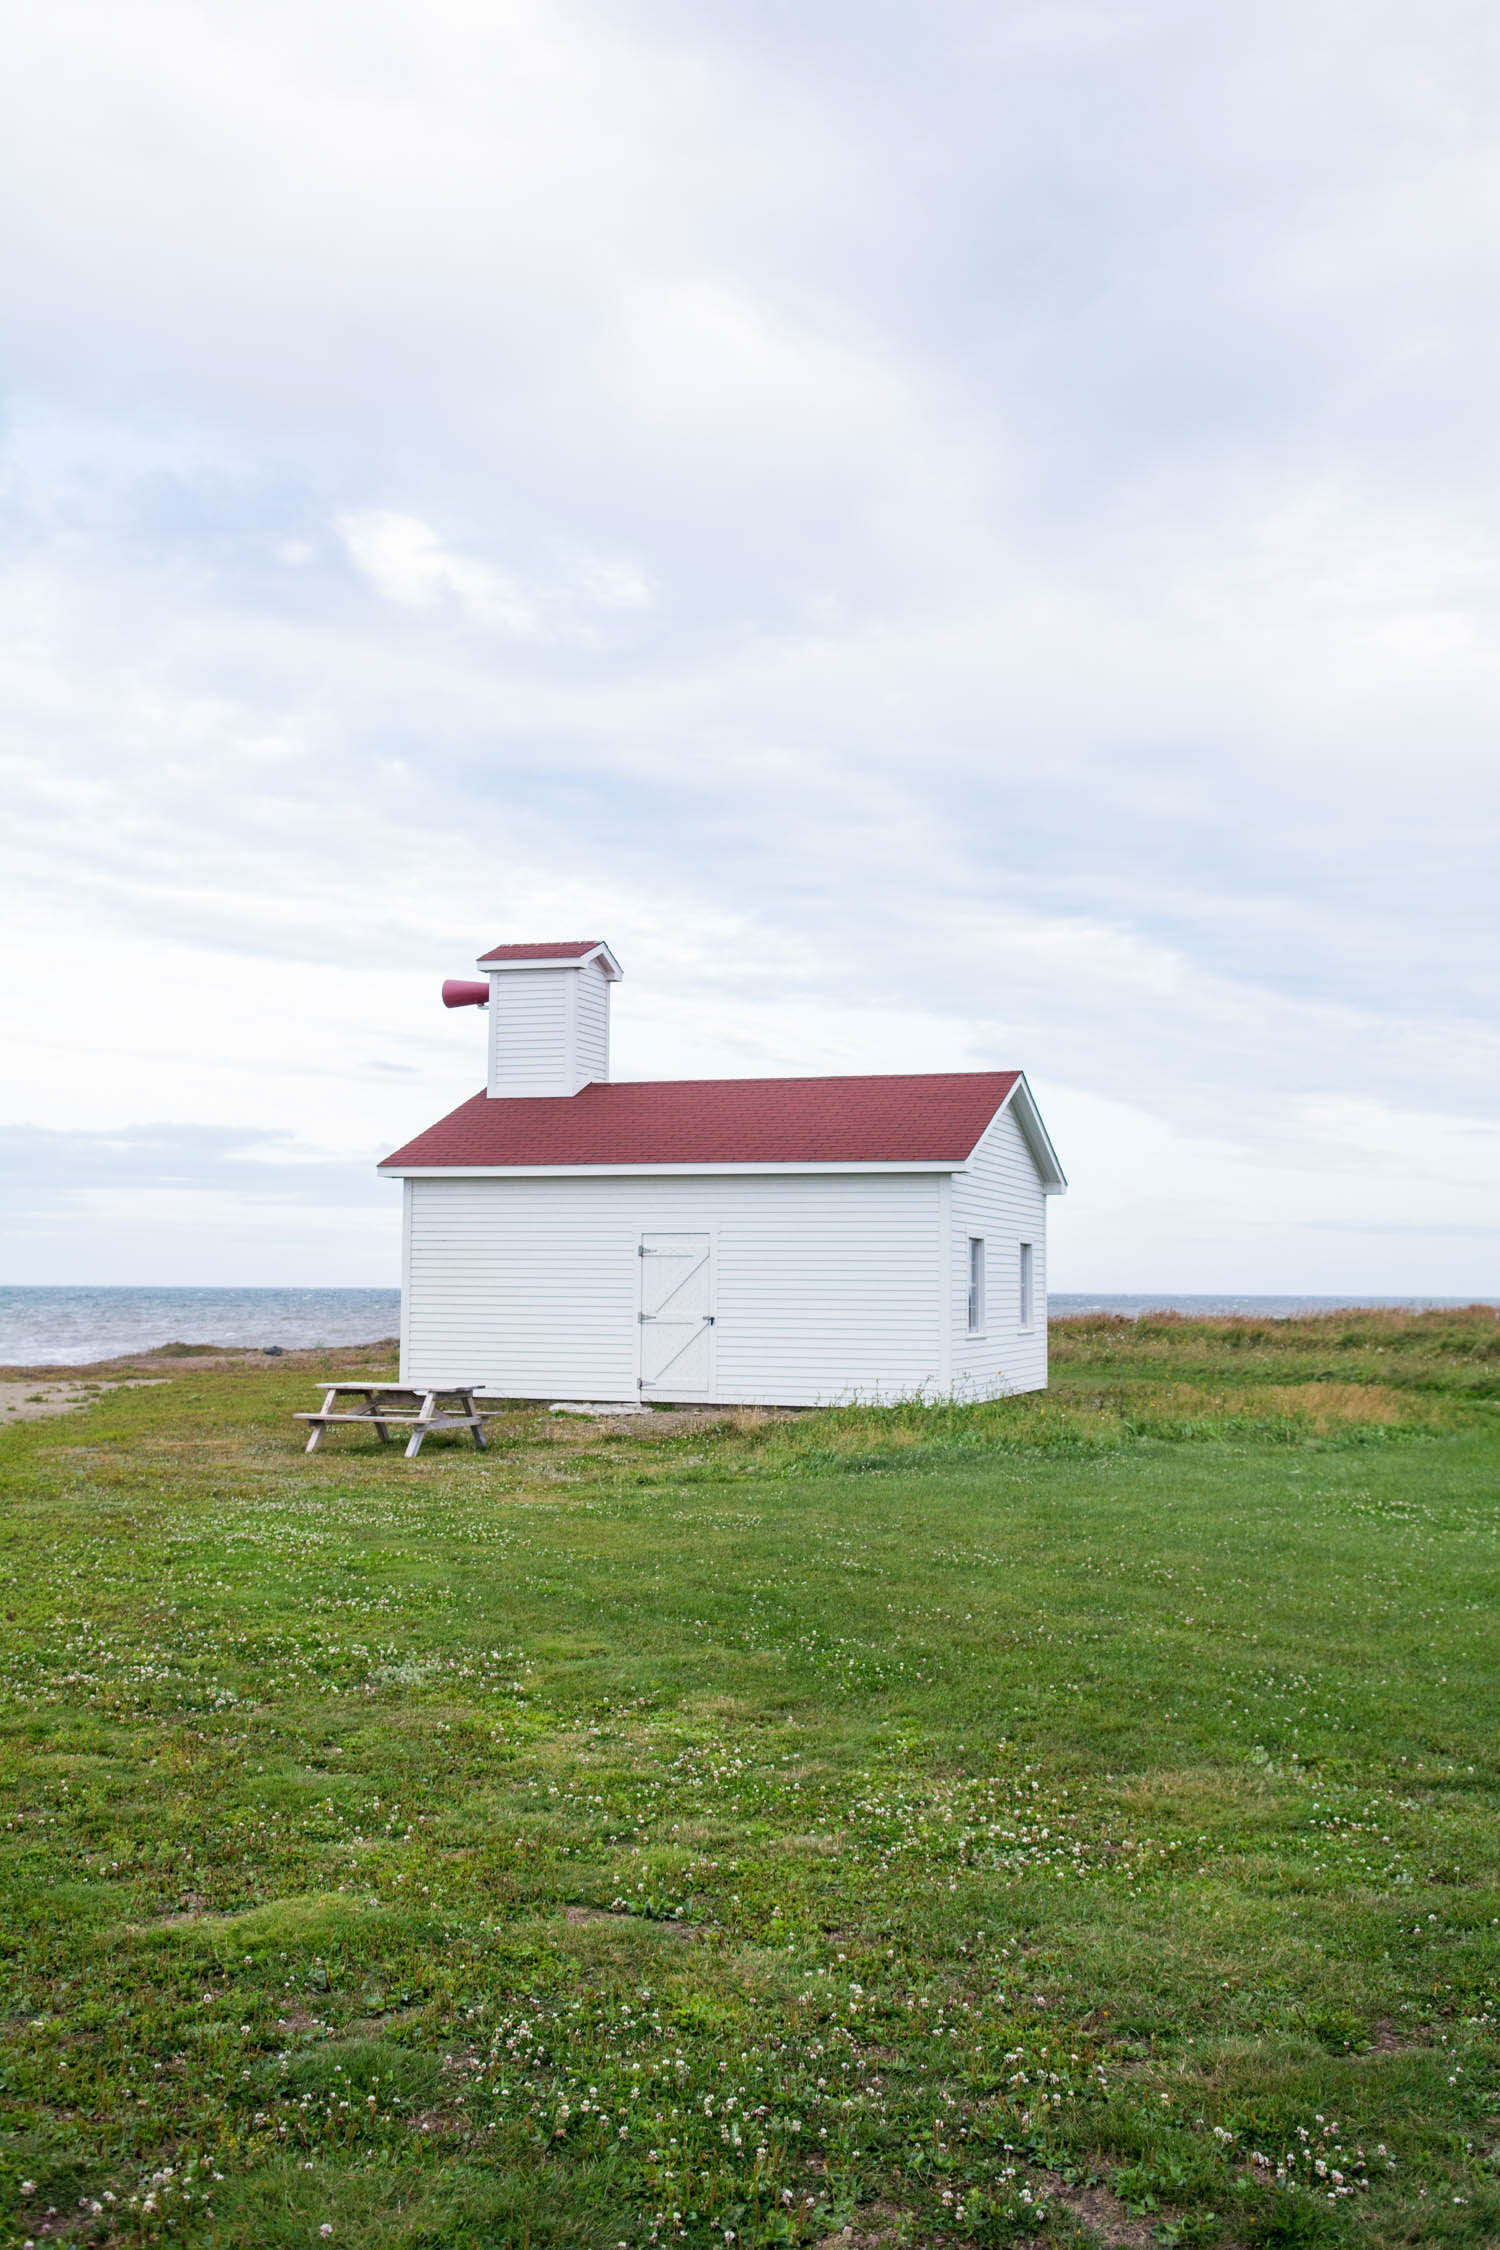 aug10-15 2014-Tourism New Brunswick-T4G Kick-summer 2014-Miramichi-Bathurst-Caraquet-Shippagan-Miscou Island-NB-web res jpg-photo by Aaron McKenzie Fraser-www.amfraser.com_AMF9581.jpg